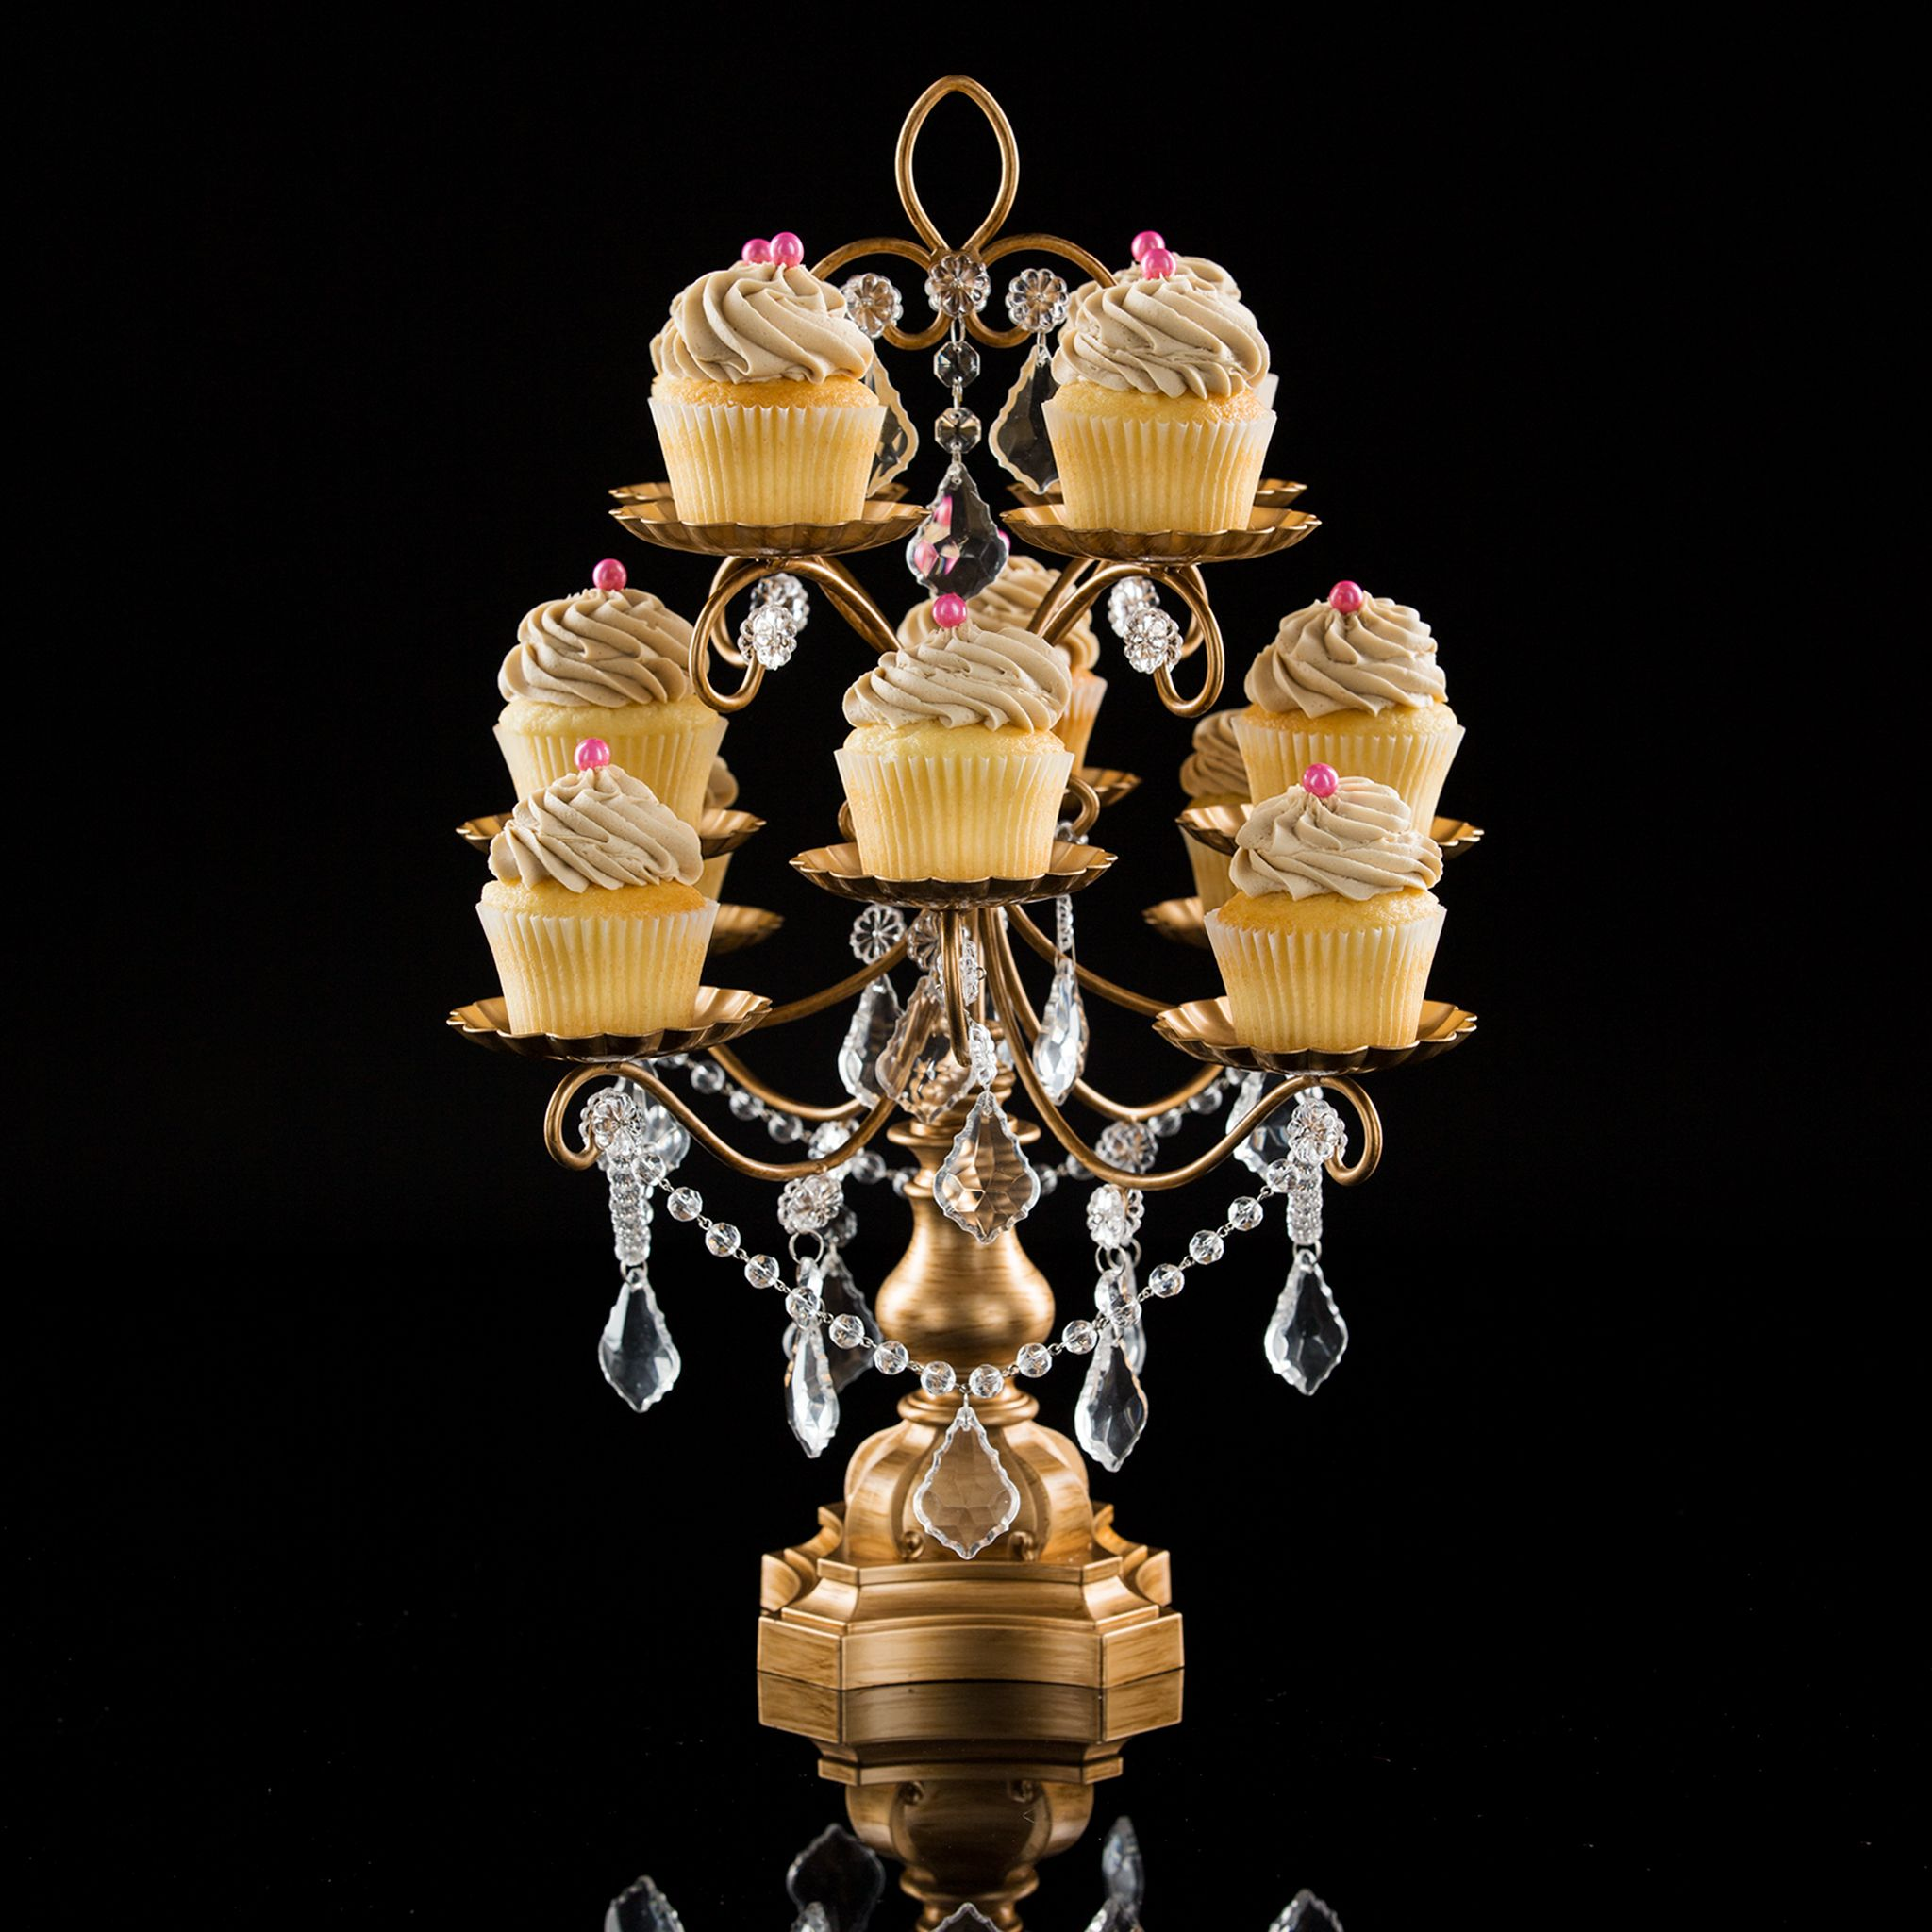 12piece vintage crystaldraped cupcake stand gold